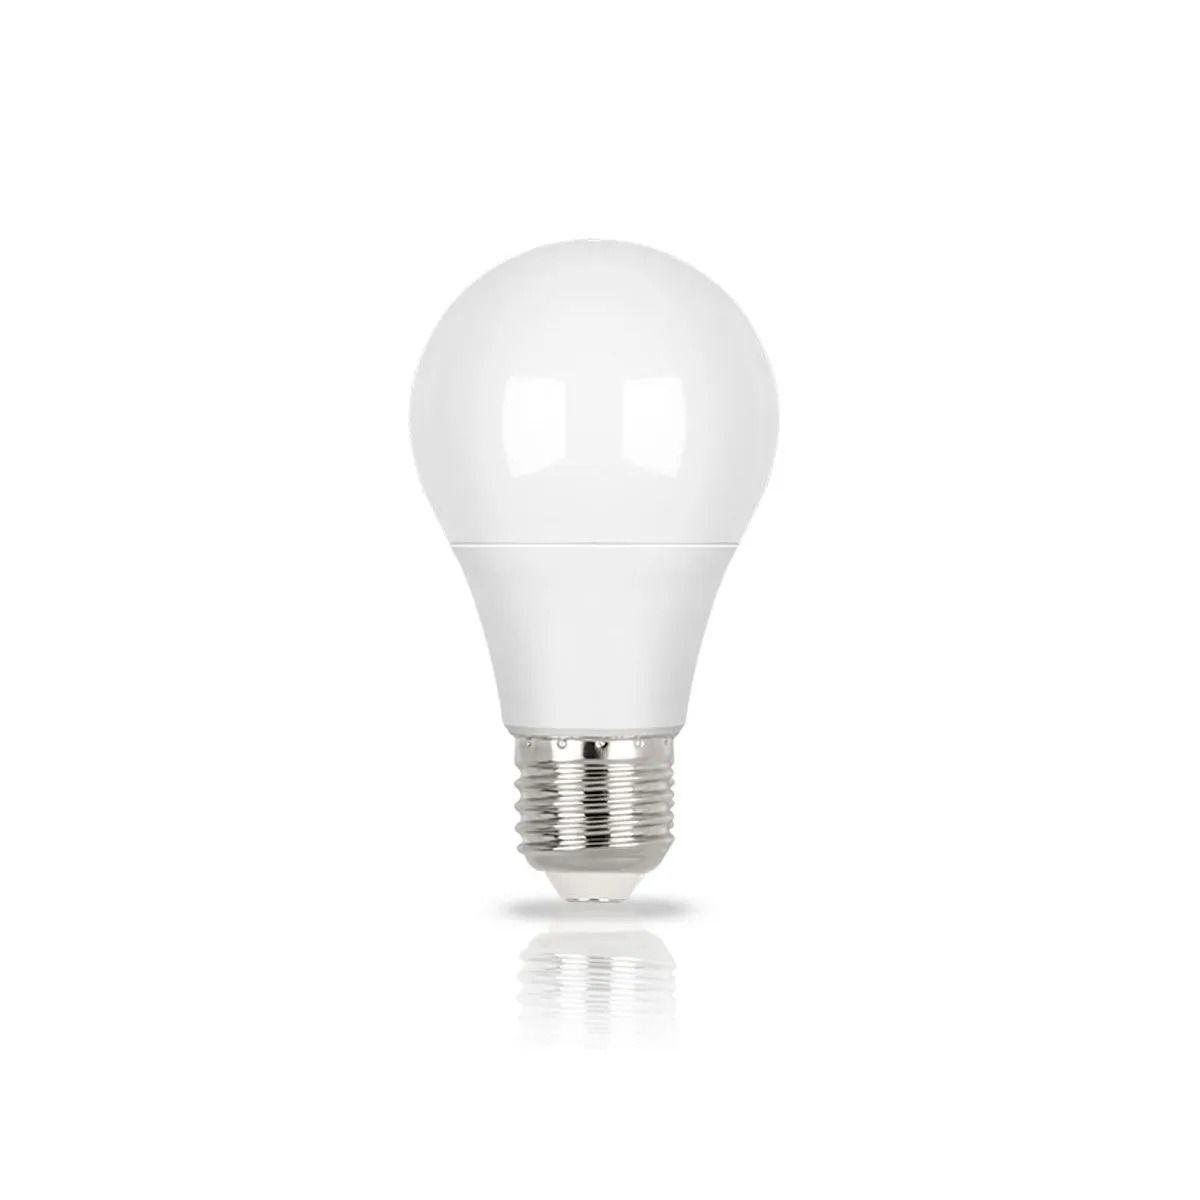 Kit 6 Lampada Led 9w E27 3000k Branco Quente Stella STH8265/30